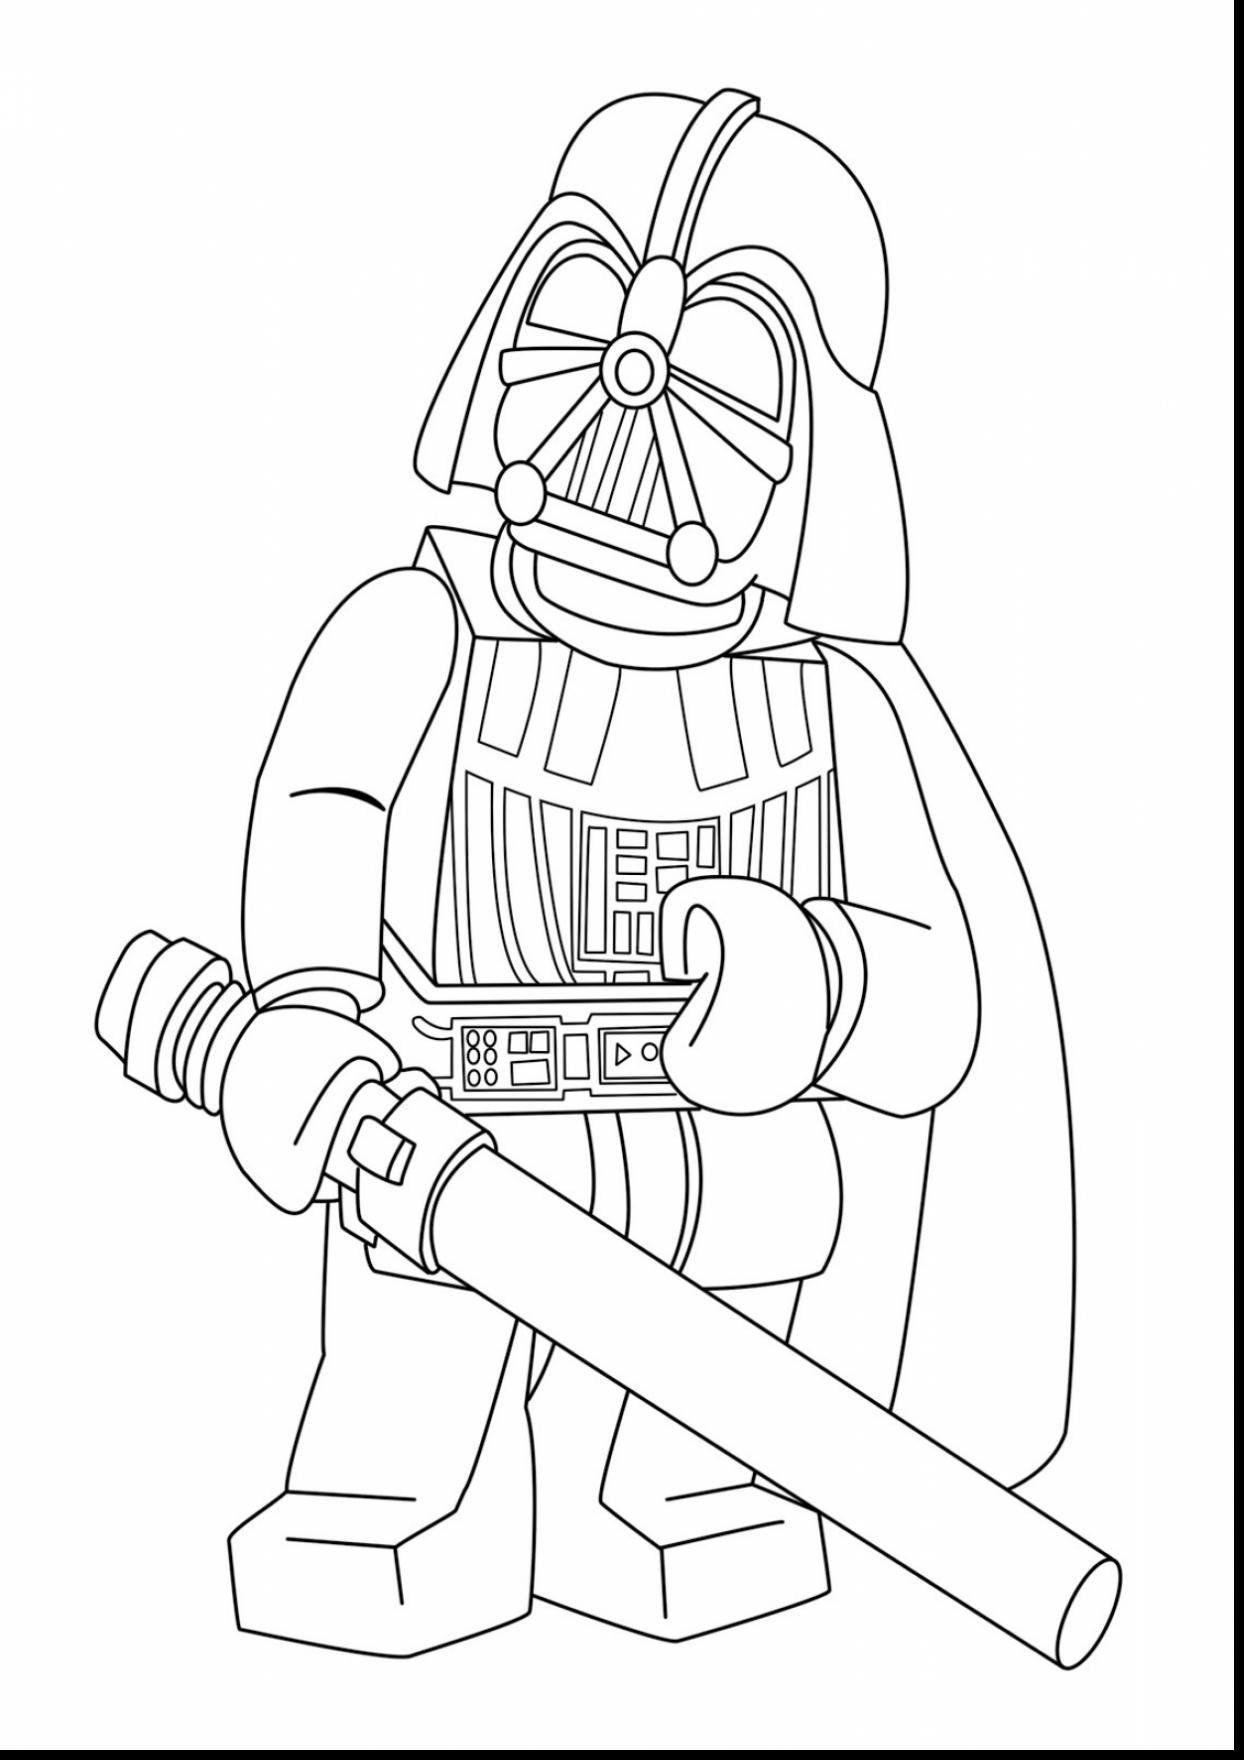 Luke Skywalker Coloring Pages Inspirational Lego Star Wars Coloring Pages In 2020 Star Wars Coloring Sheet Lego Coloring Pages Star Wars Colors